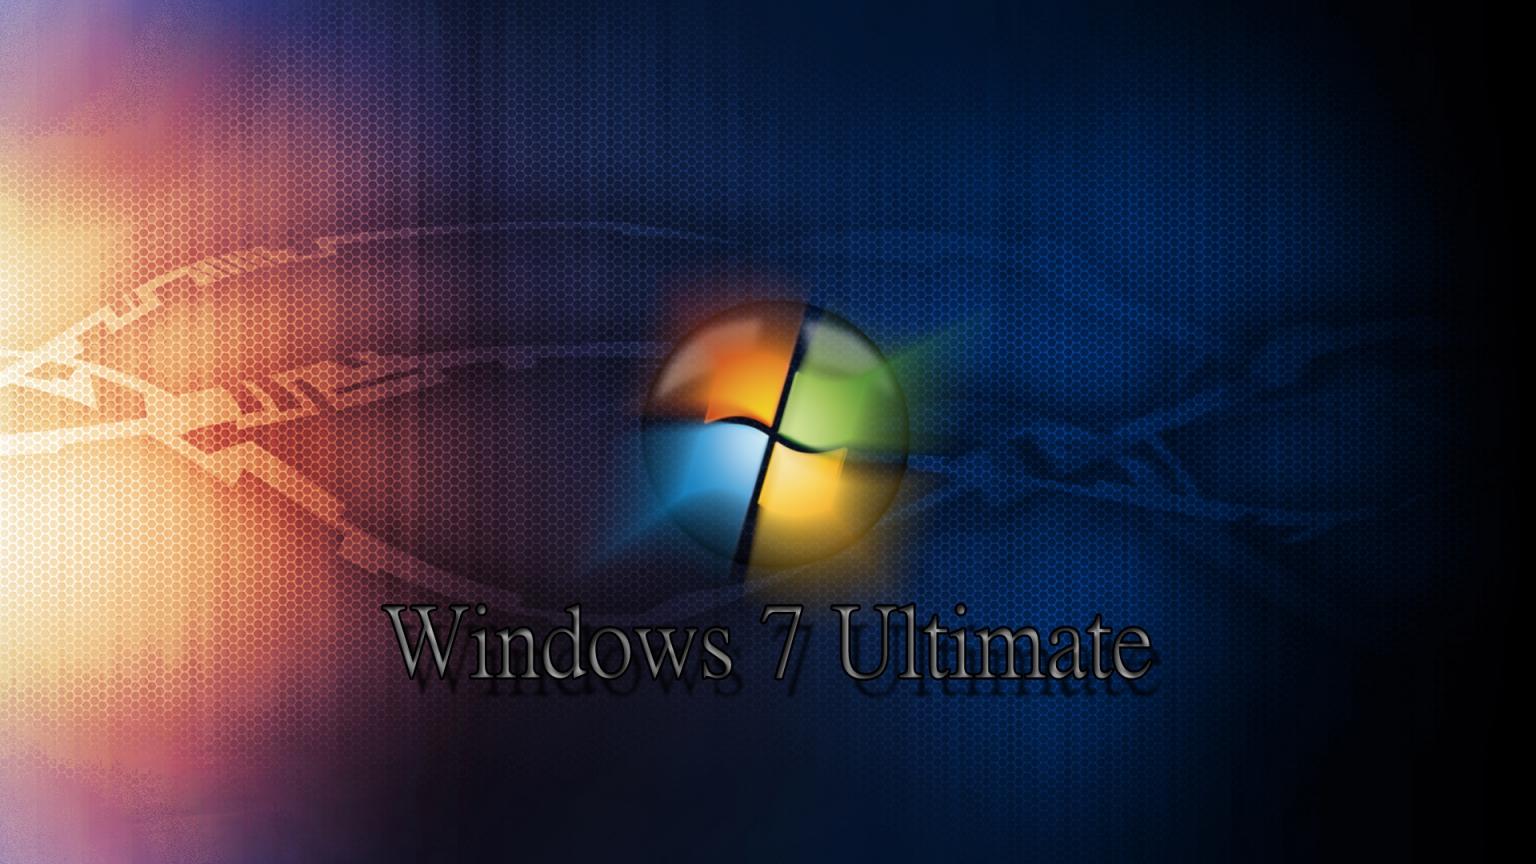 download Technet Microsoft wallpaper 138545 [1920x1200] for 1536x864